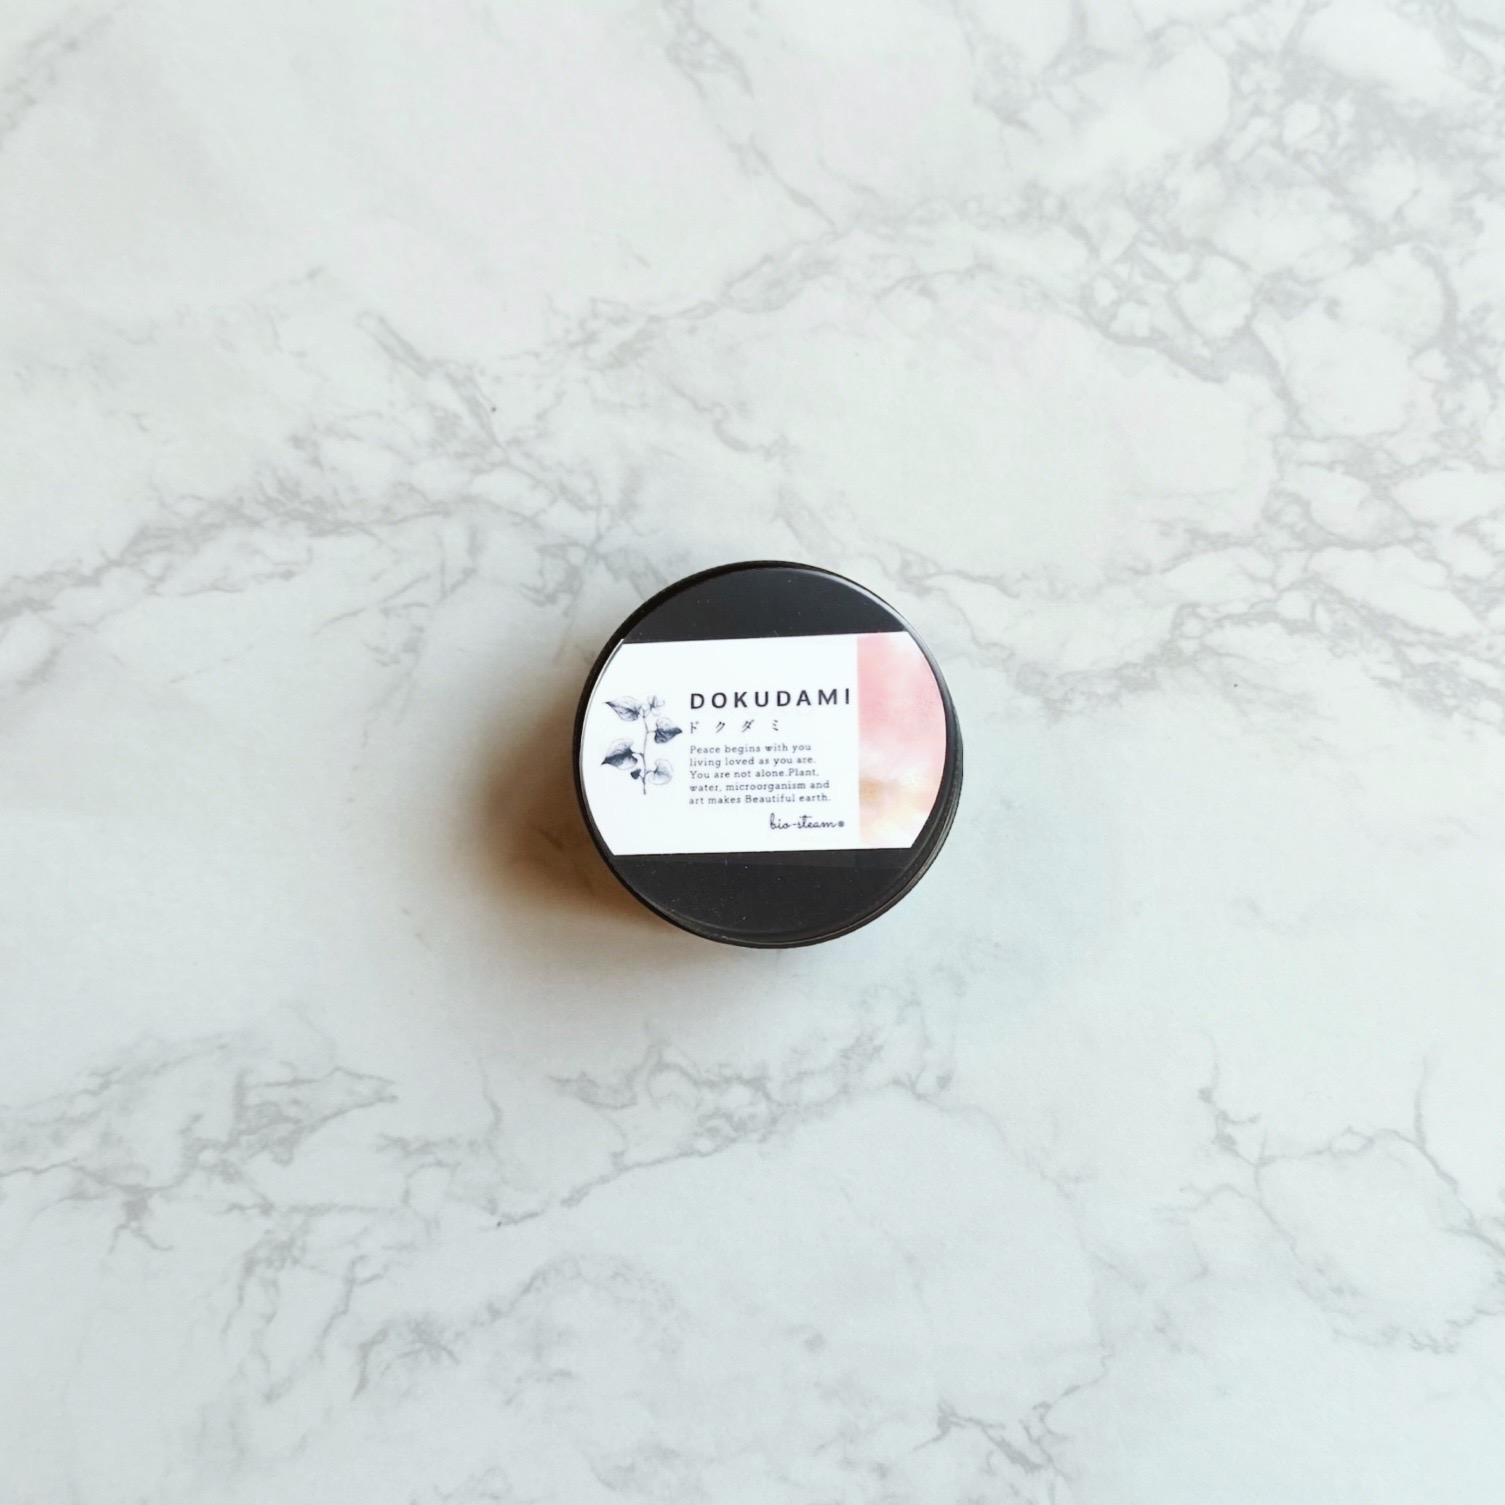 ★【Black Label】 国産ドクダミパウダー